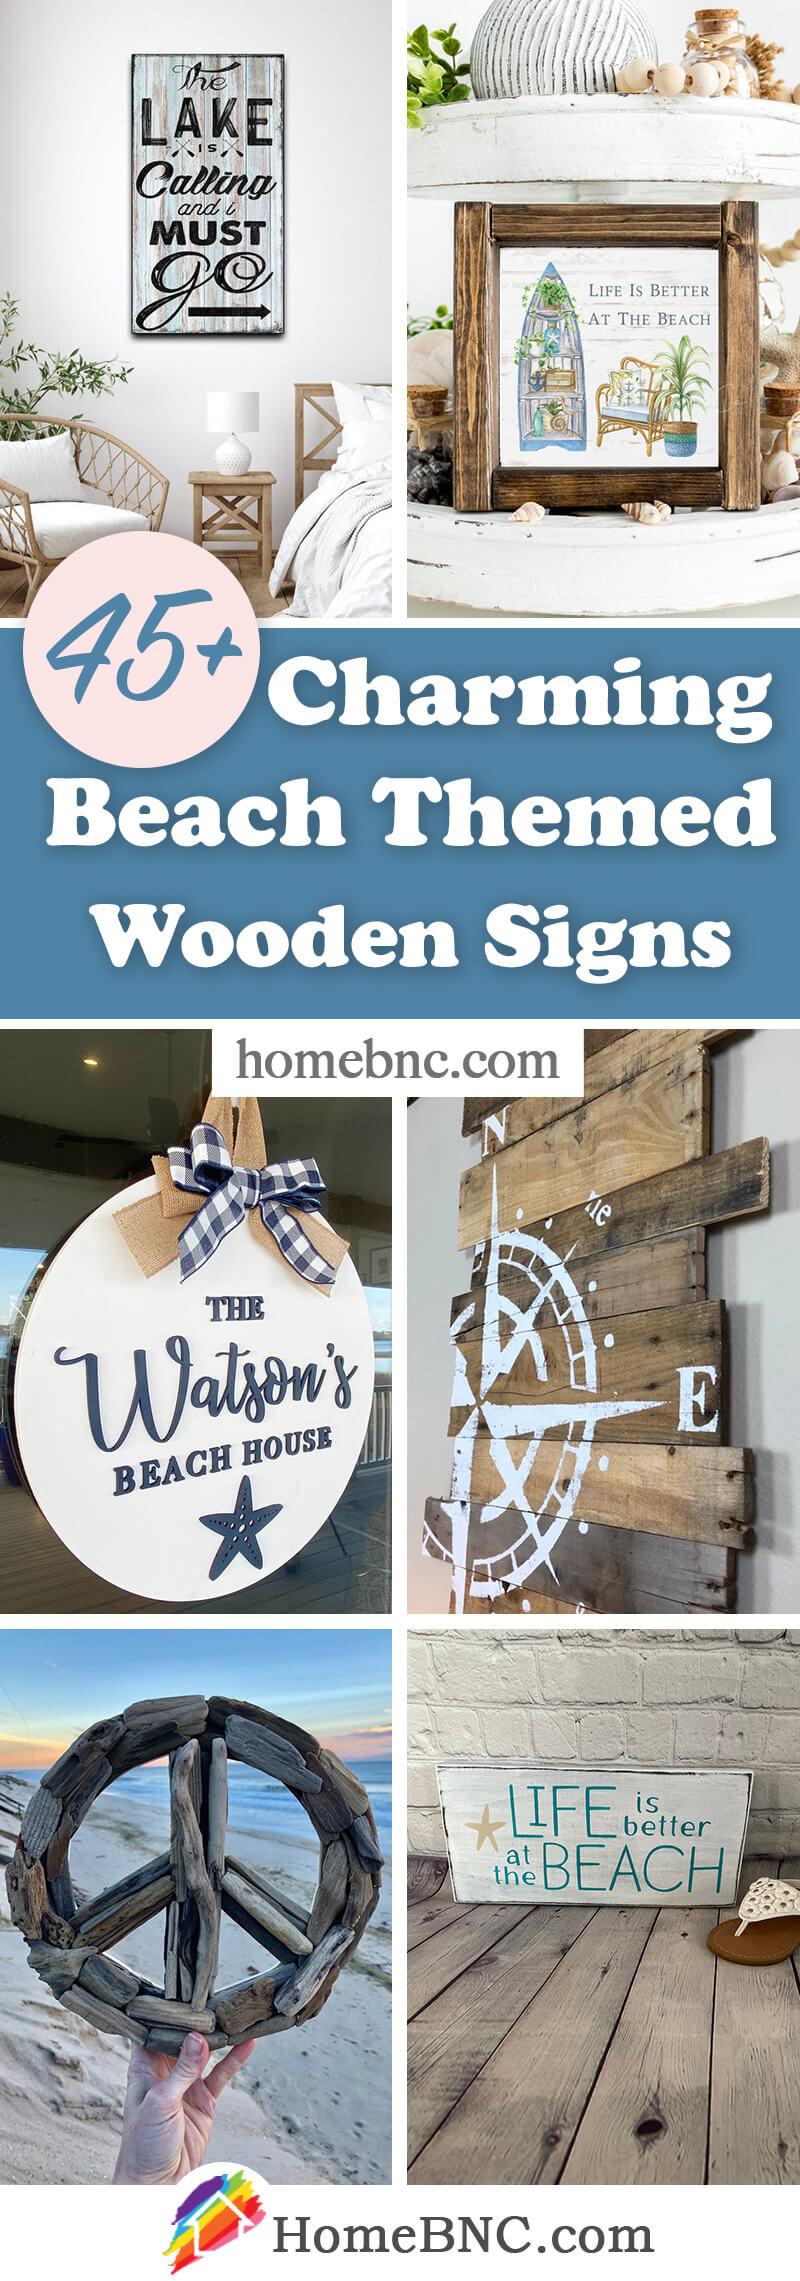 Beach Themed Wooden Sign Ideas